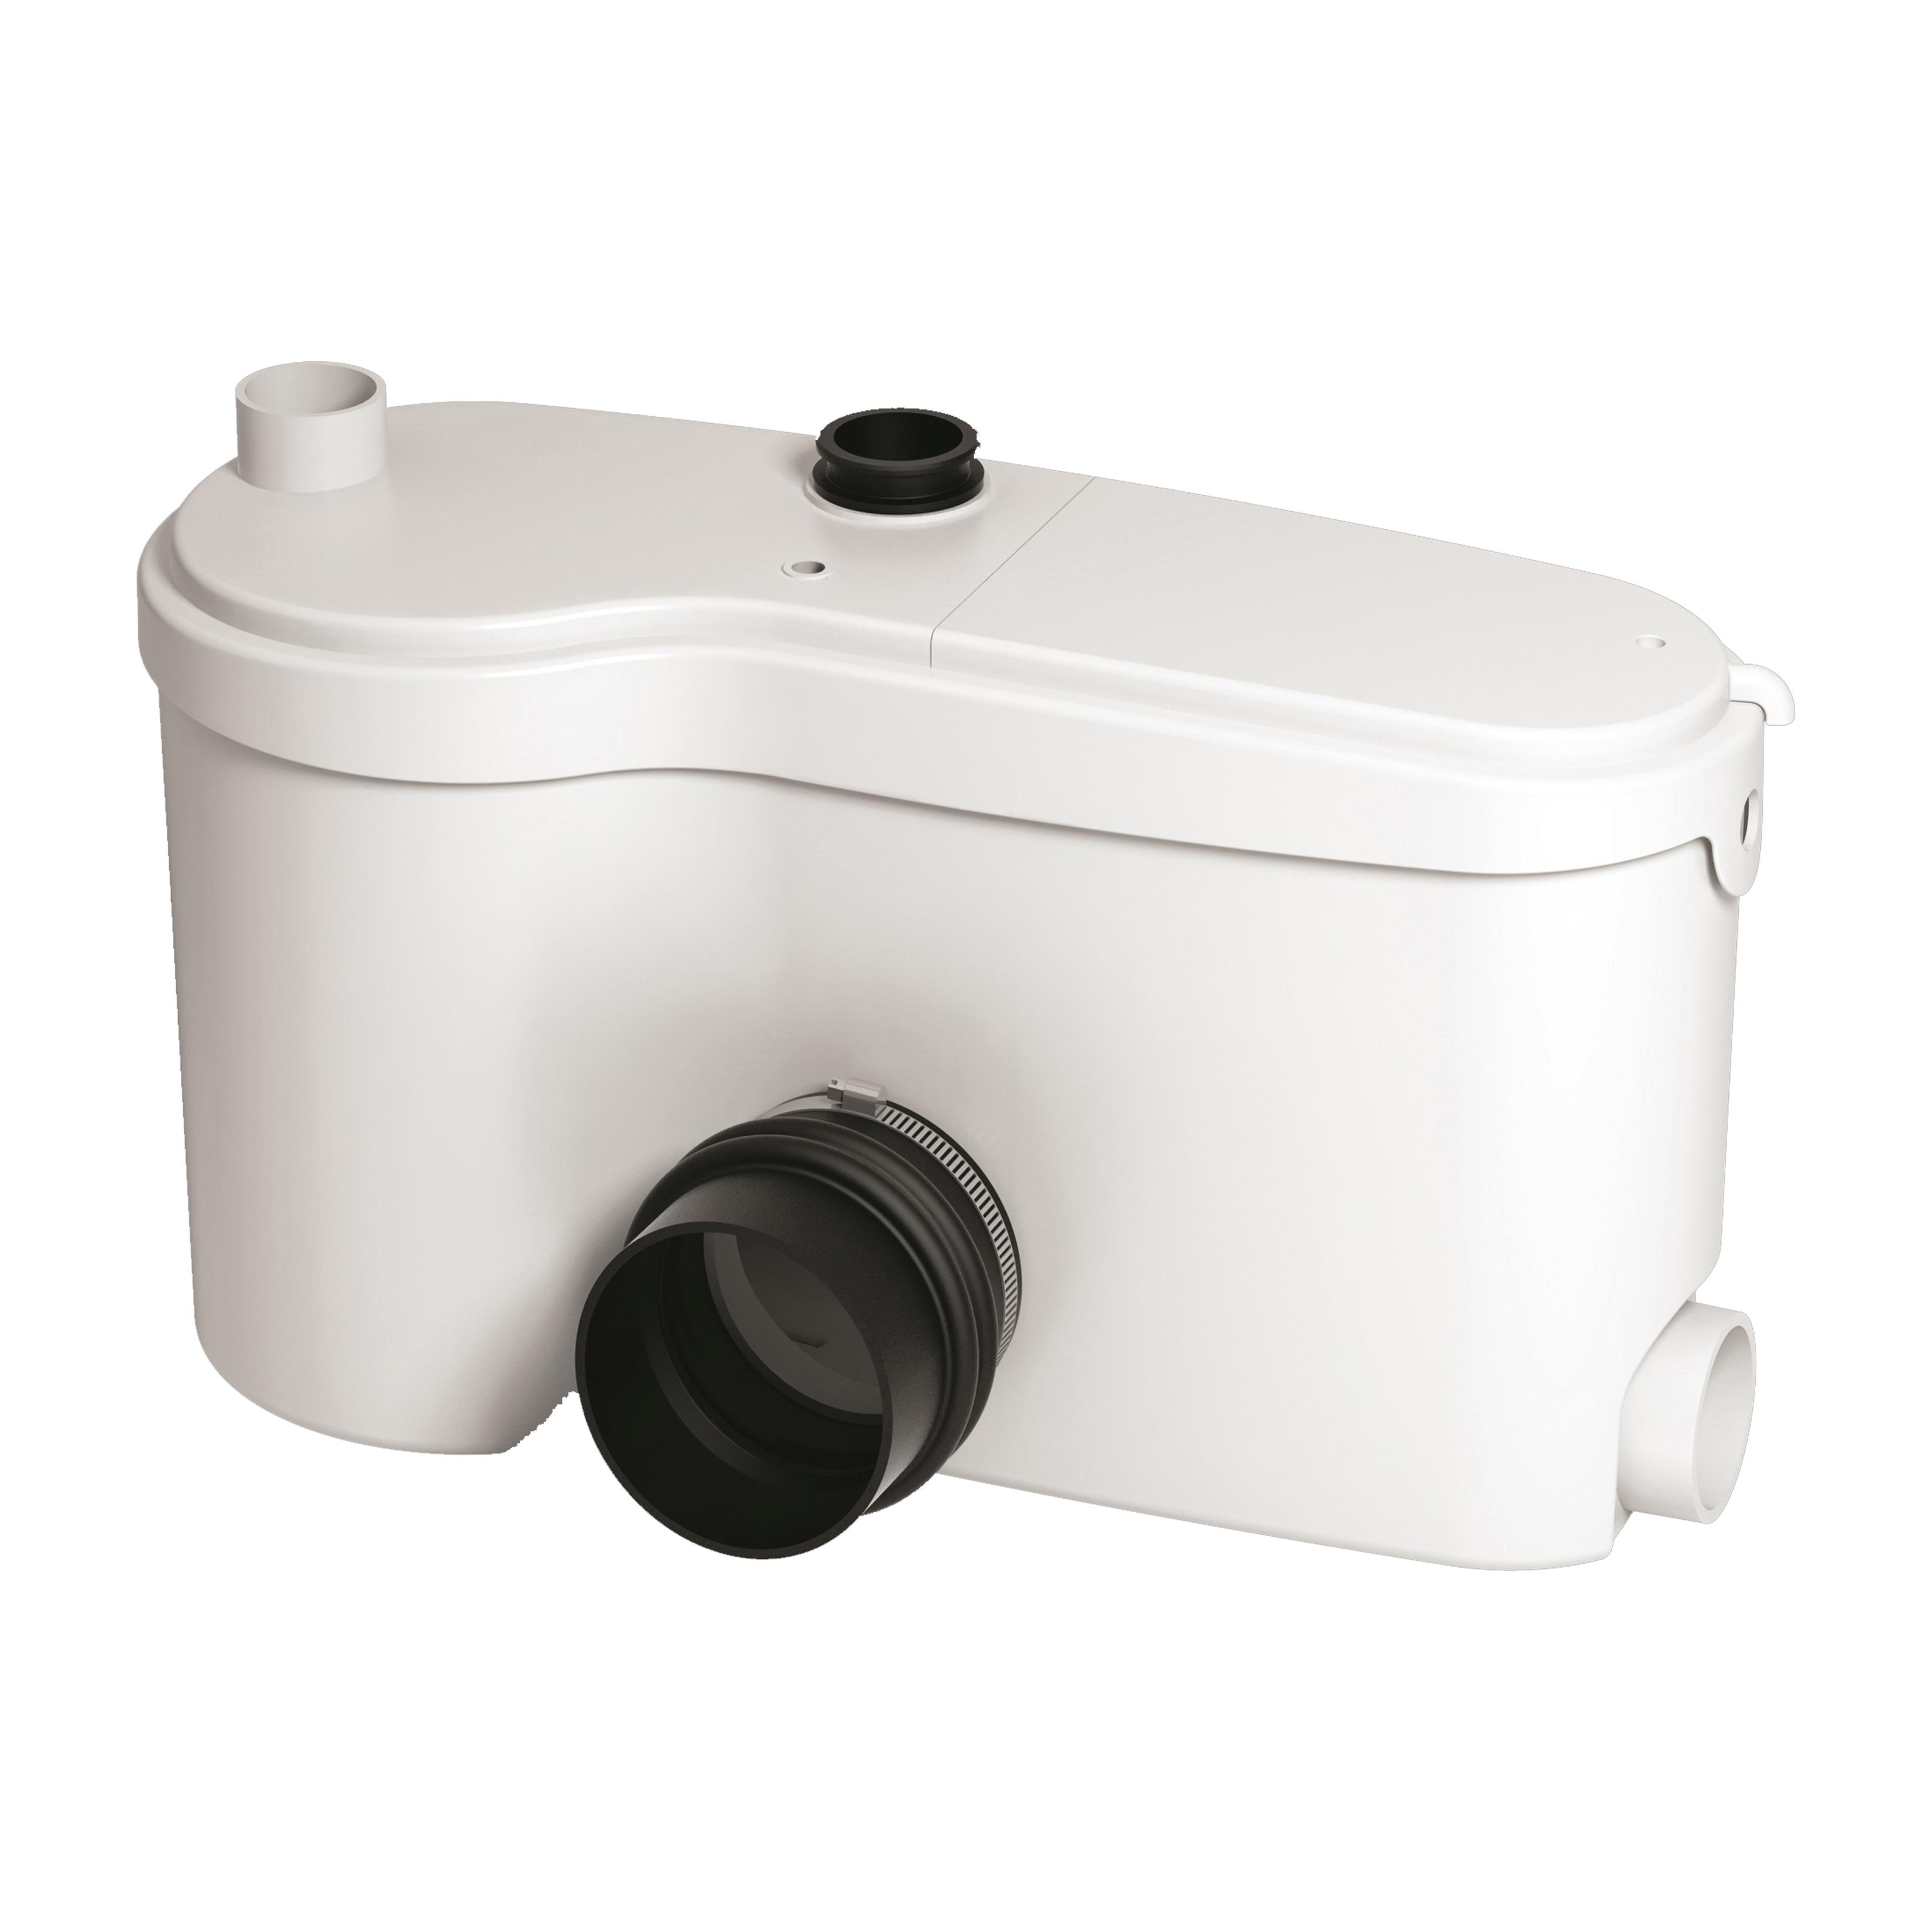 Saniflo® SANIGRIND® 014 1-Speed Pro Grinder Pump, 25 ft Max Head, 120 VAC